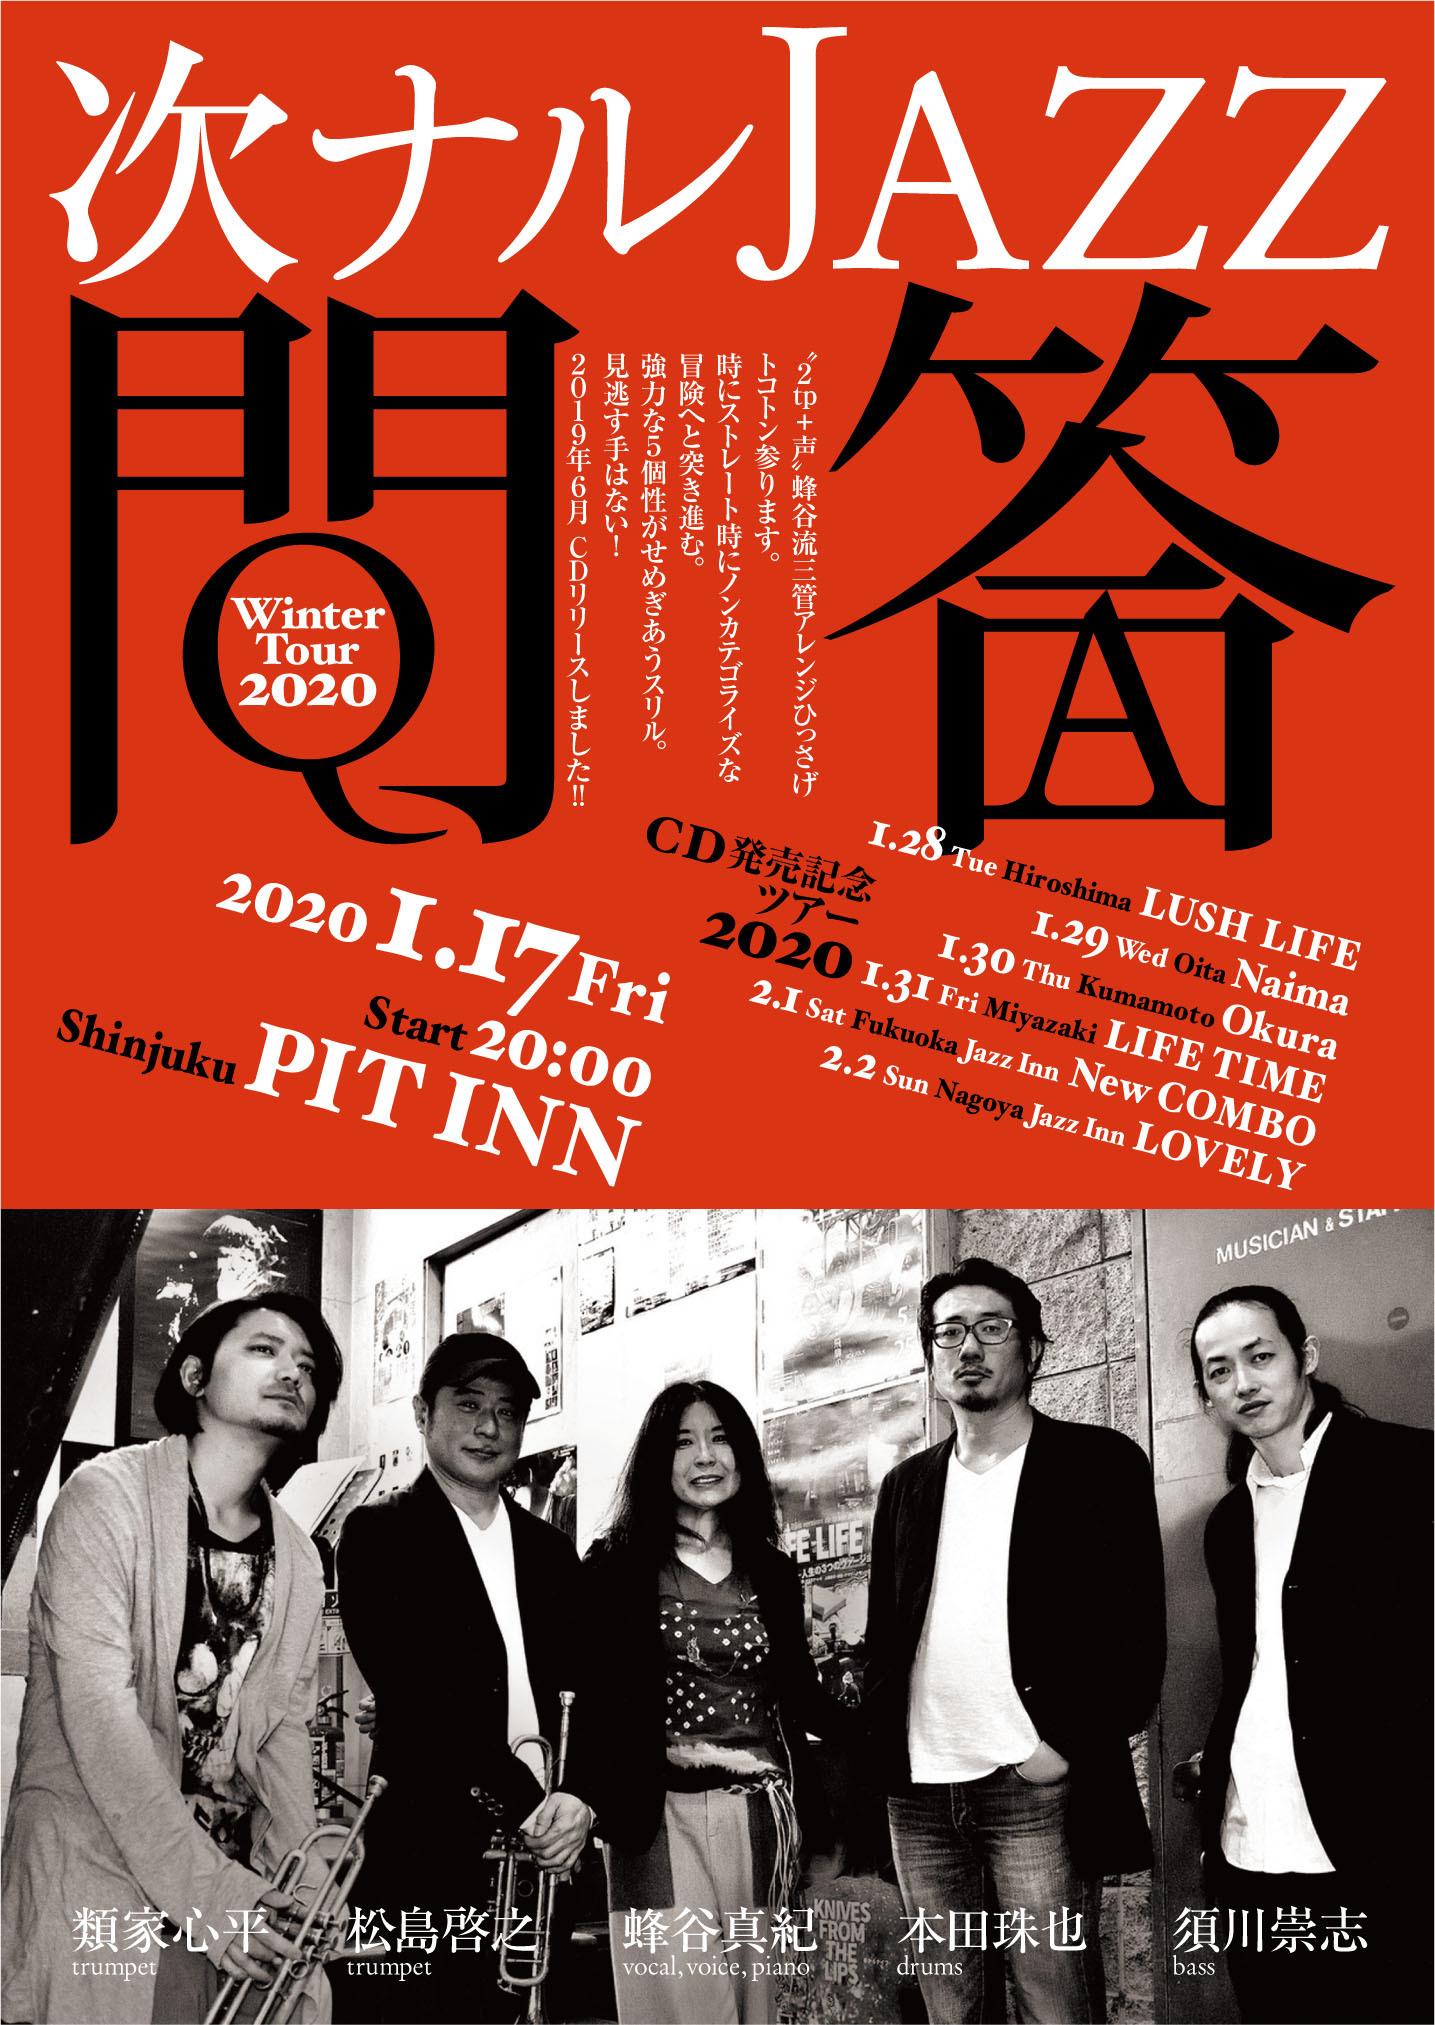 Maki Hachiya 2020:2月〜3月 live schedule_d0239981_13175093.jpg